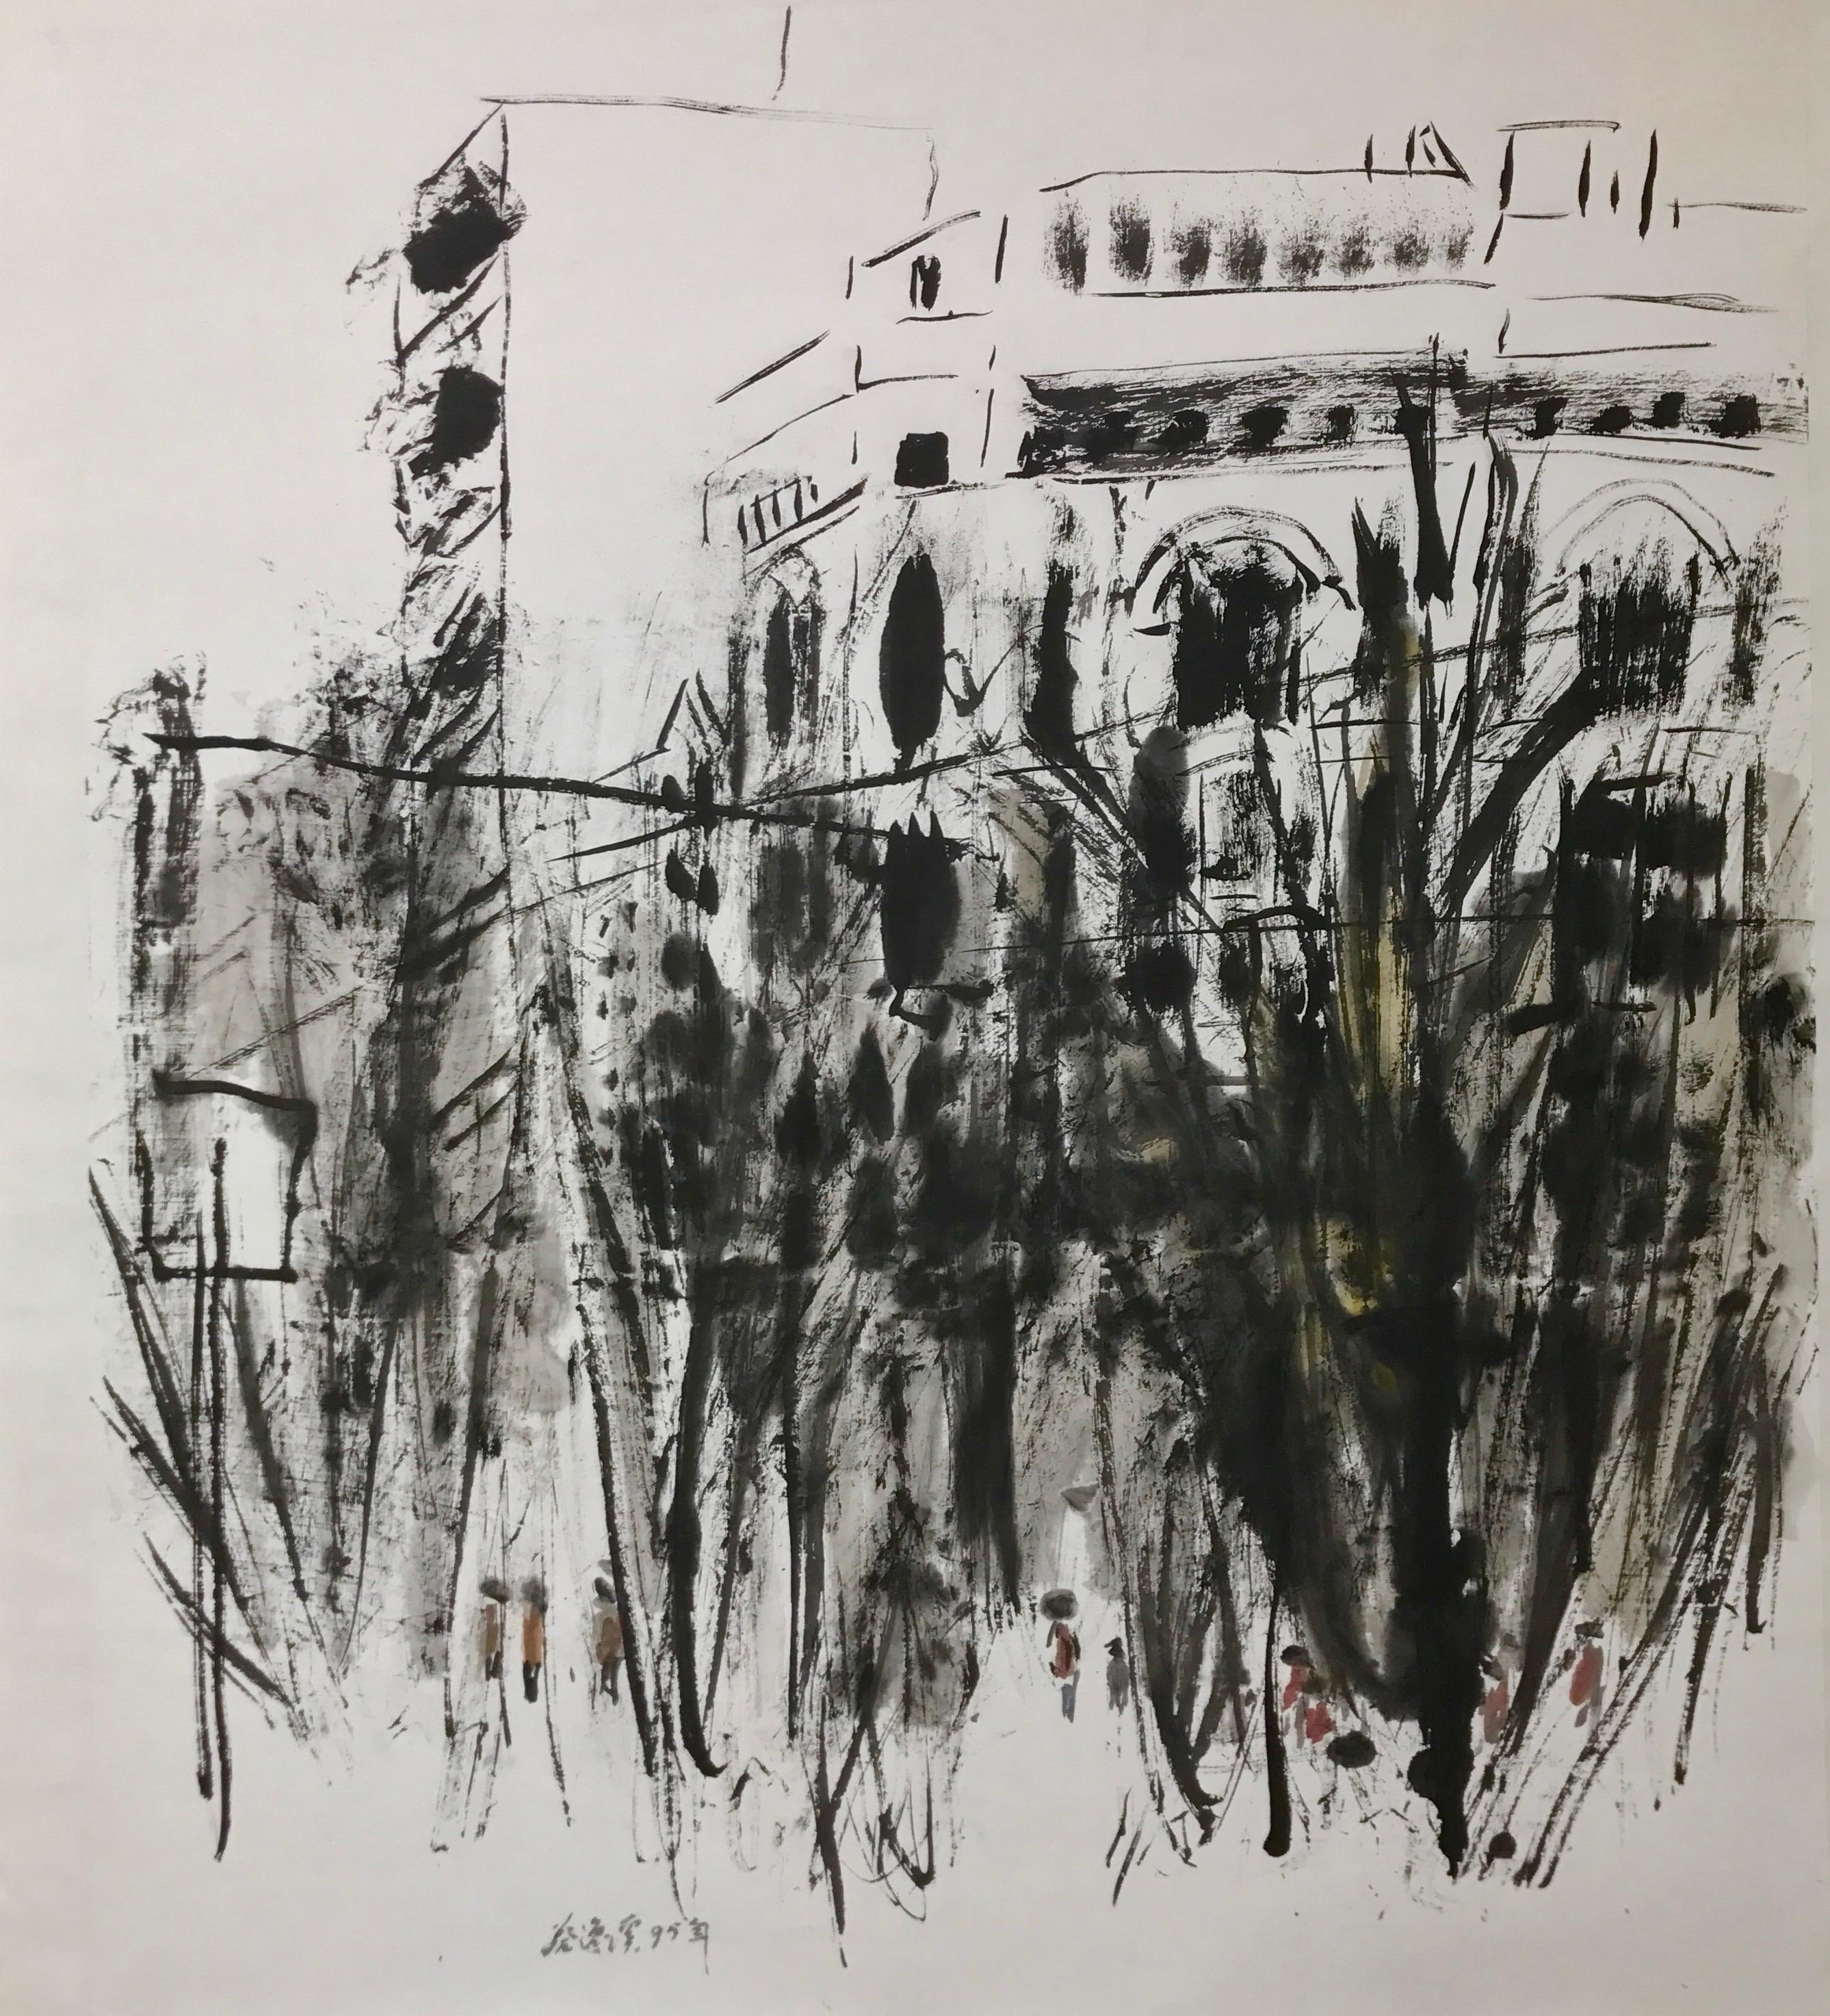 Chua Ek Kay, Street Scene, ink and colour on paper, 98 x 84 cm, 1995